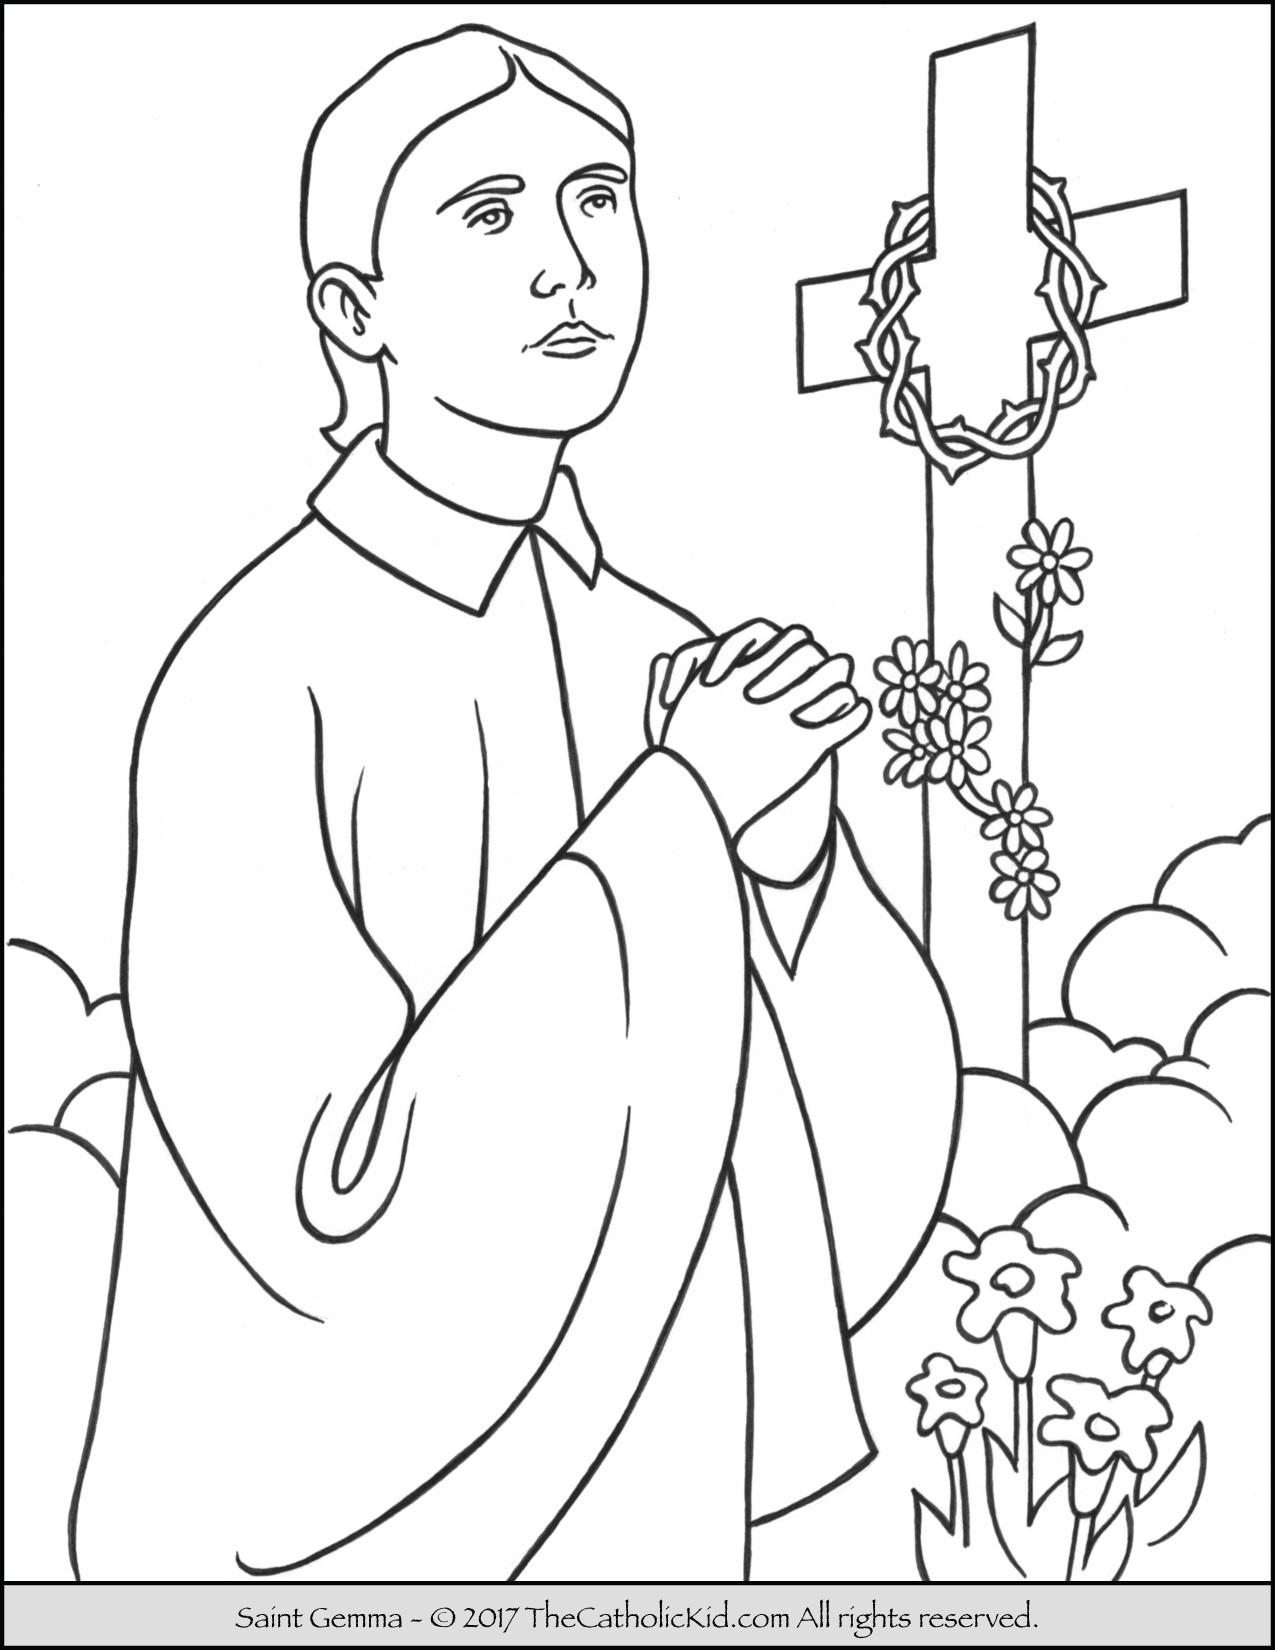 Catholic Coloring Books  Saint Gemma Coloring Page TheCatholicKid